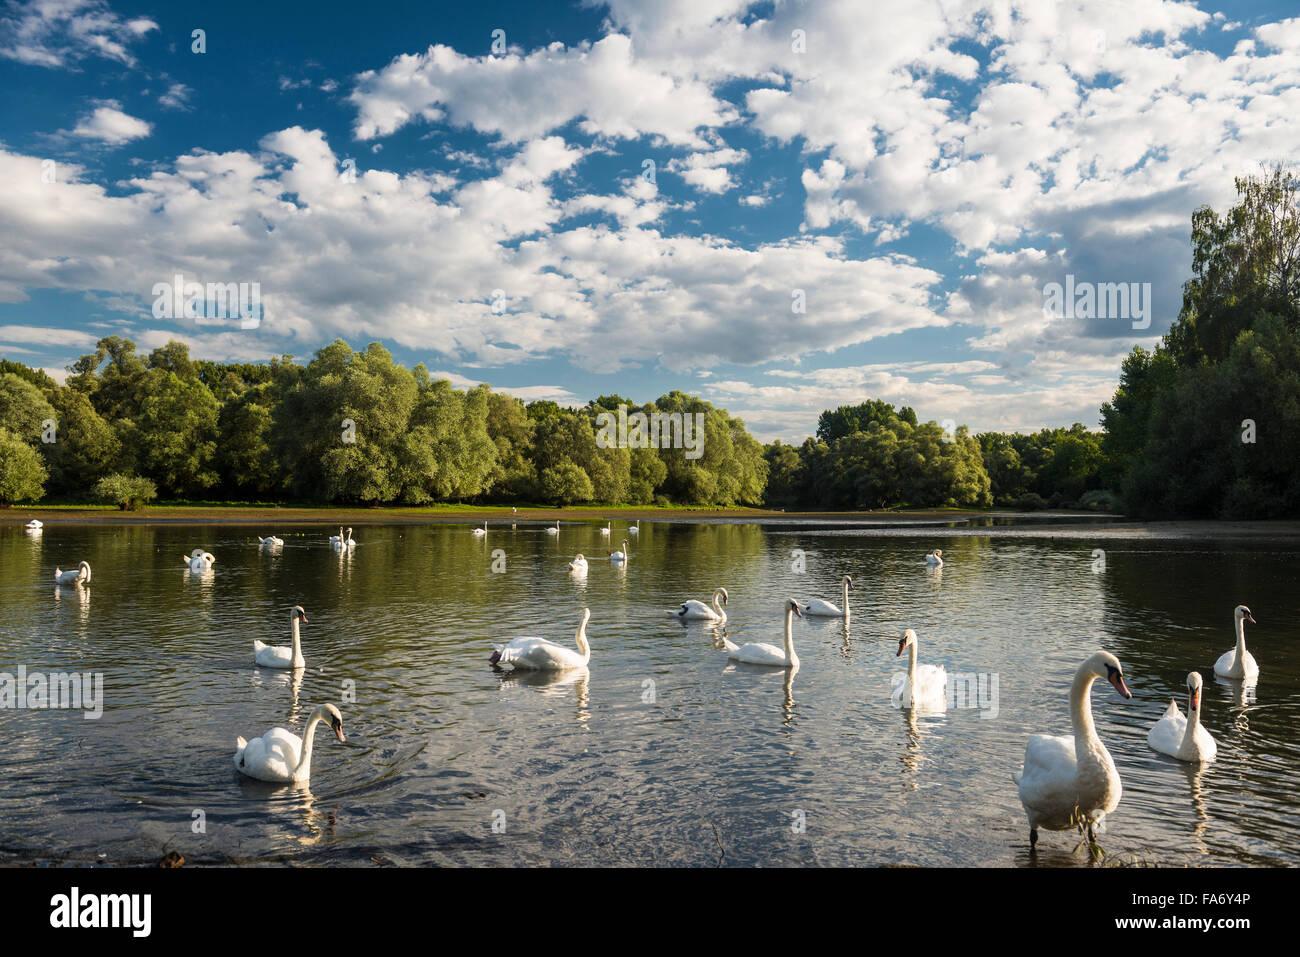 Swans (Cygnus sp.), Delta de la Sauer, nature reserve between Munchhausen and Seltz, Alsace, Bas-Rhin, France - Stock Image